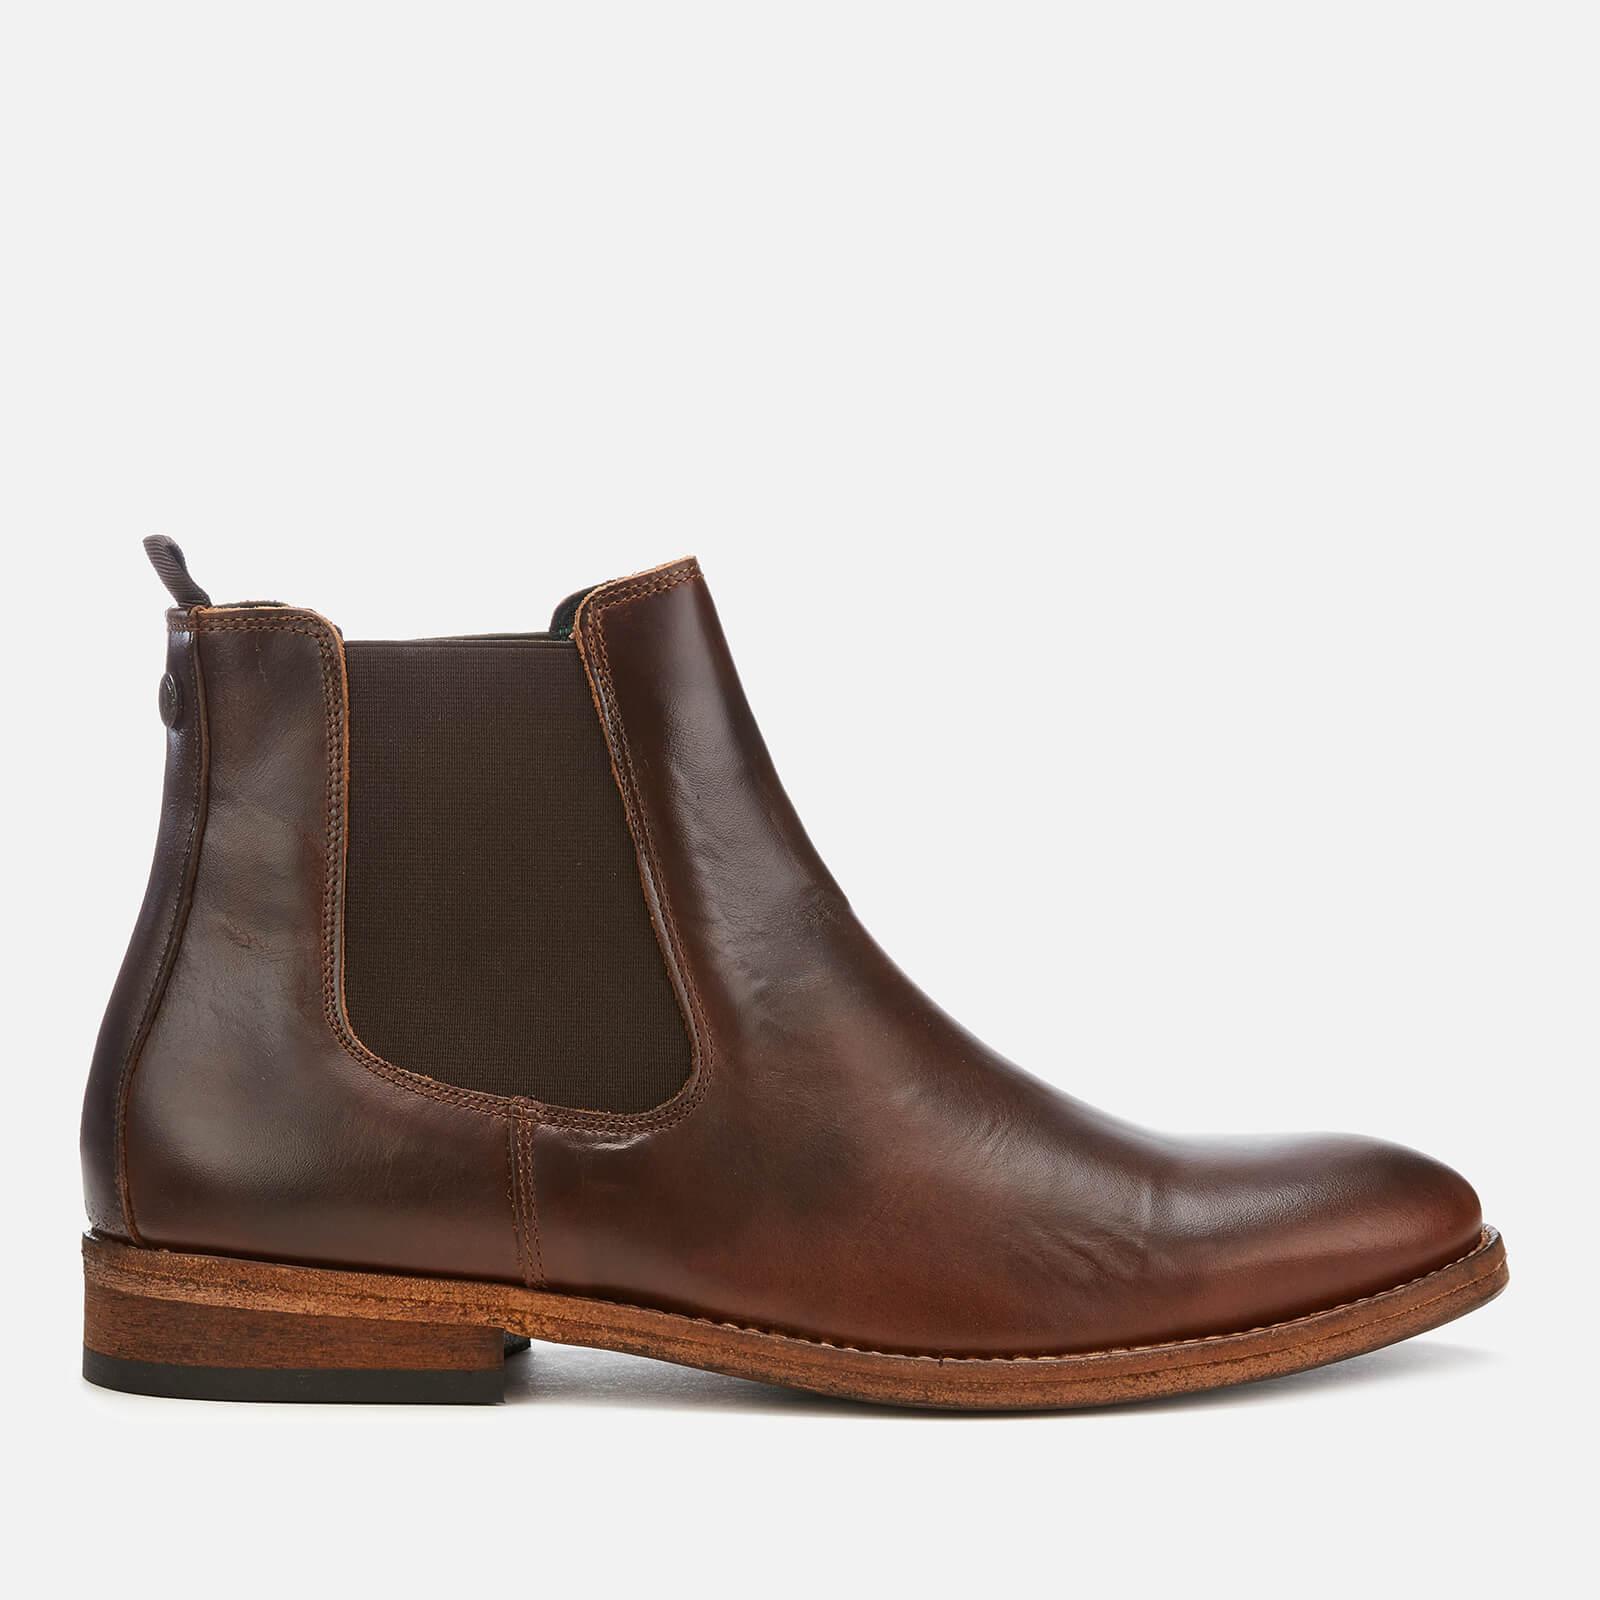 Barbour Mens Bedlington Leather Chelsea Boots Mahogany Uk 8 Tan